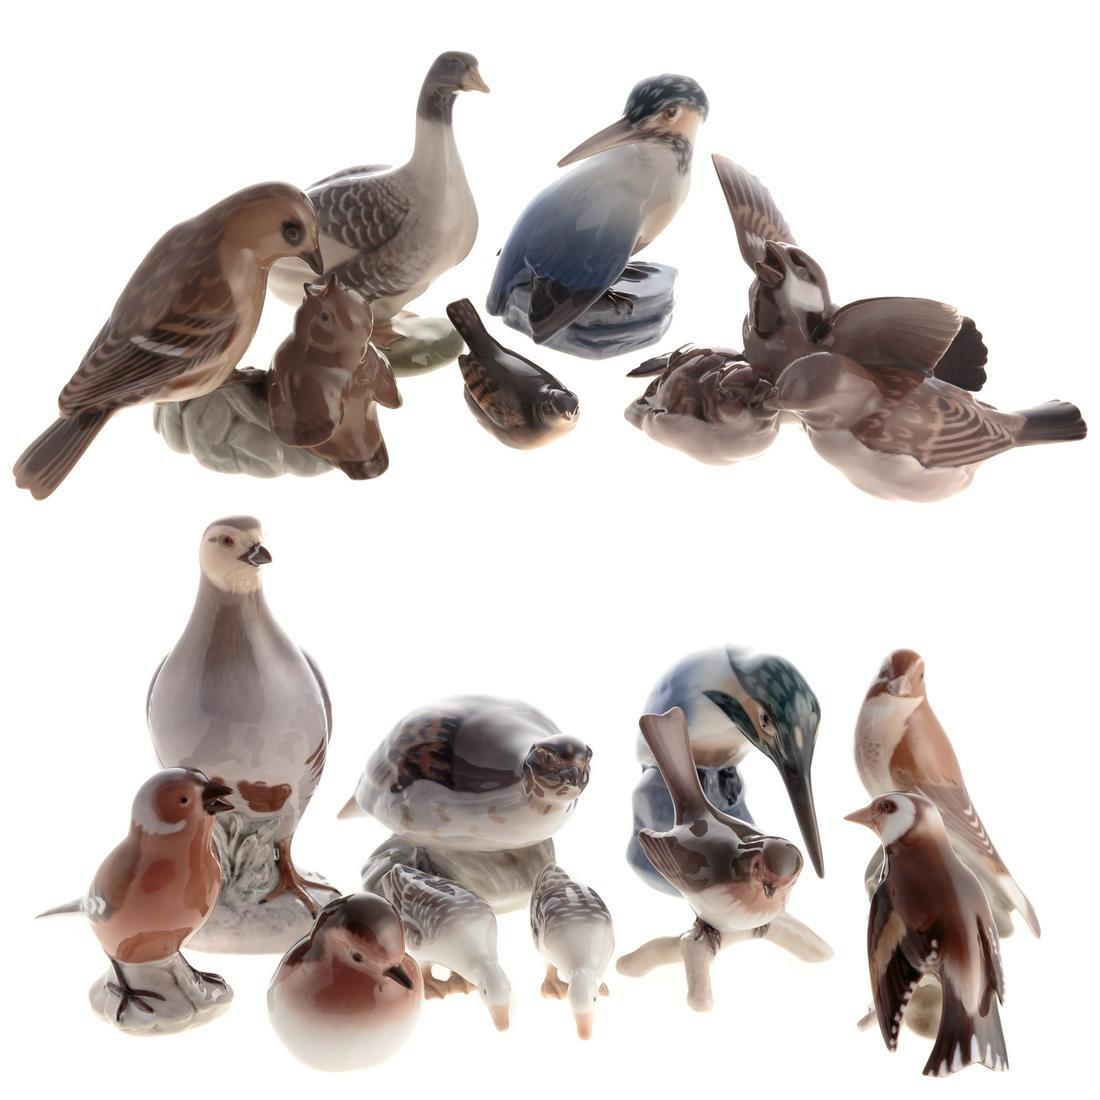 15 Assorted Bing & Grondahl Porcelain Birds